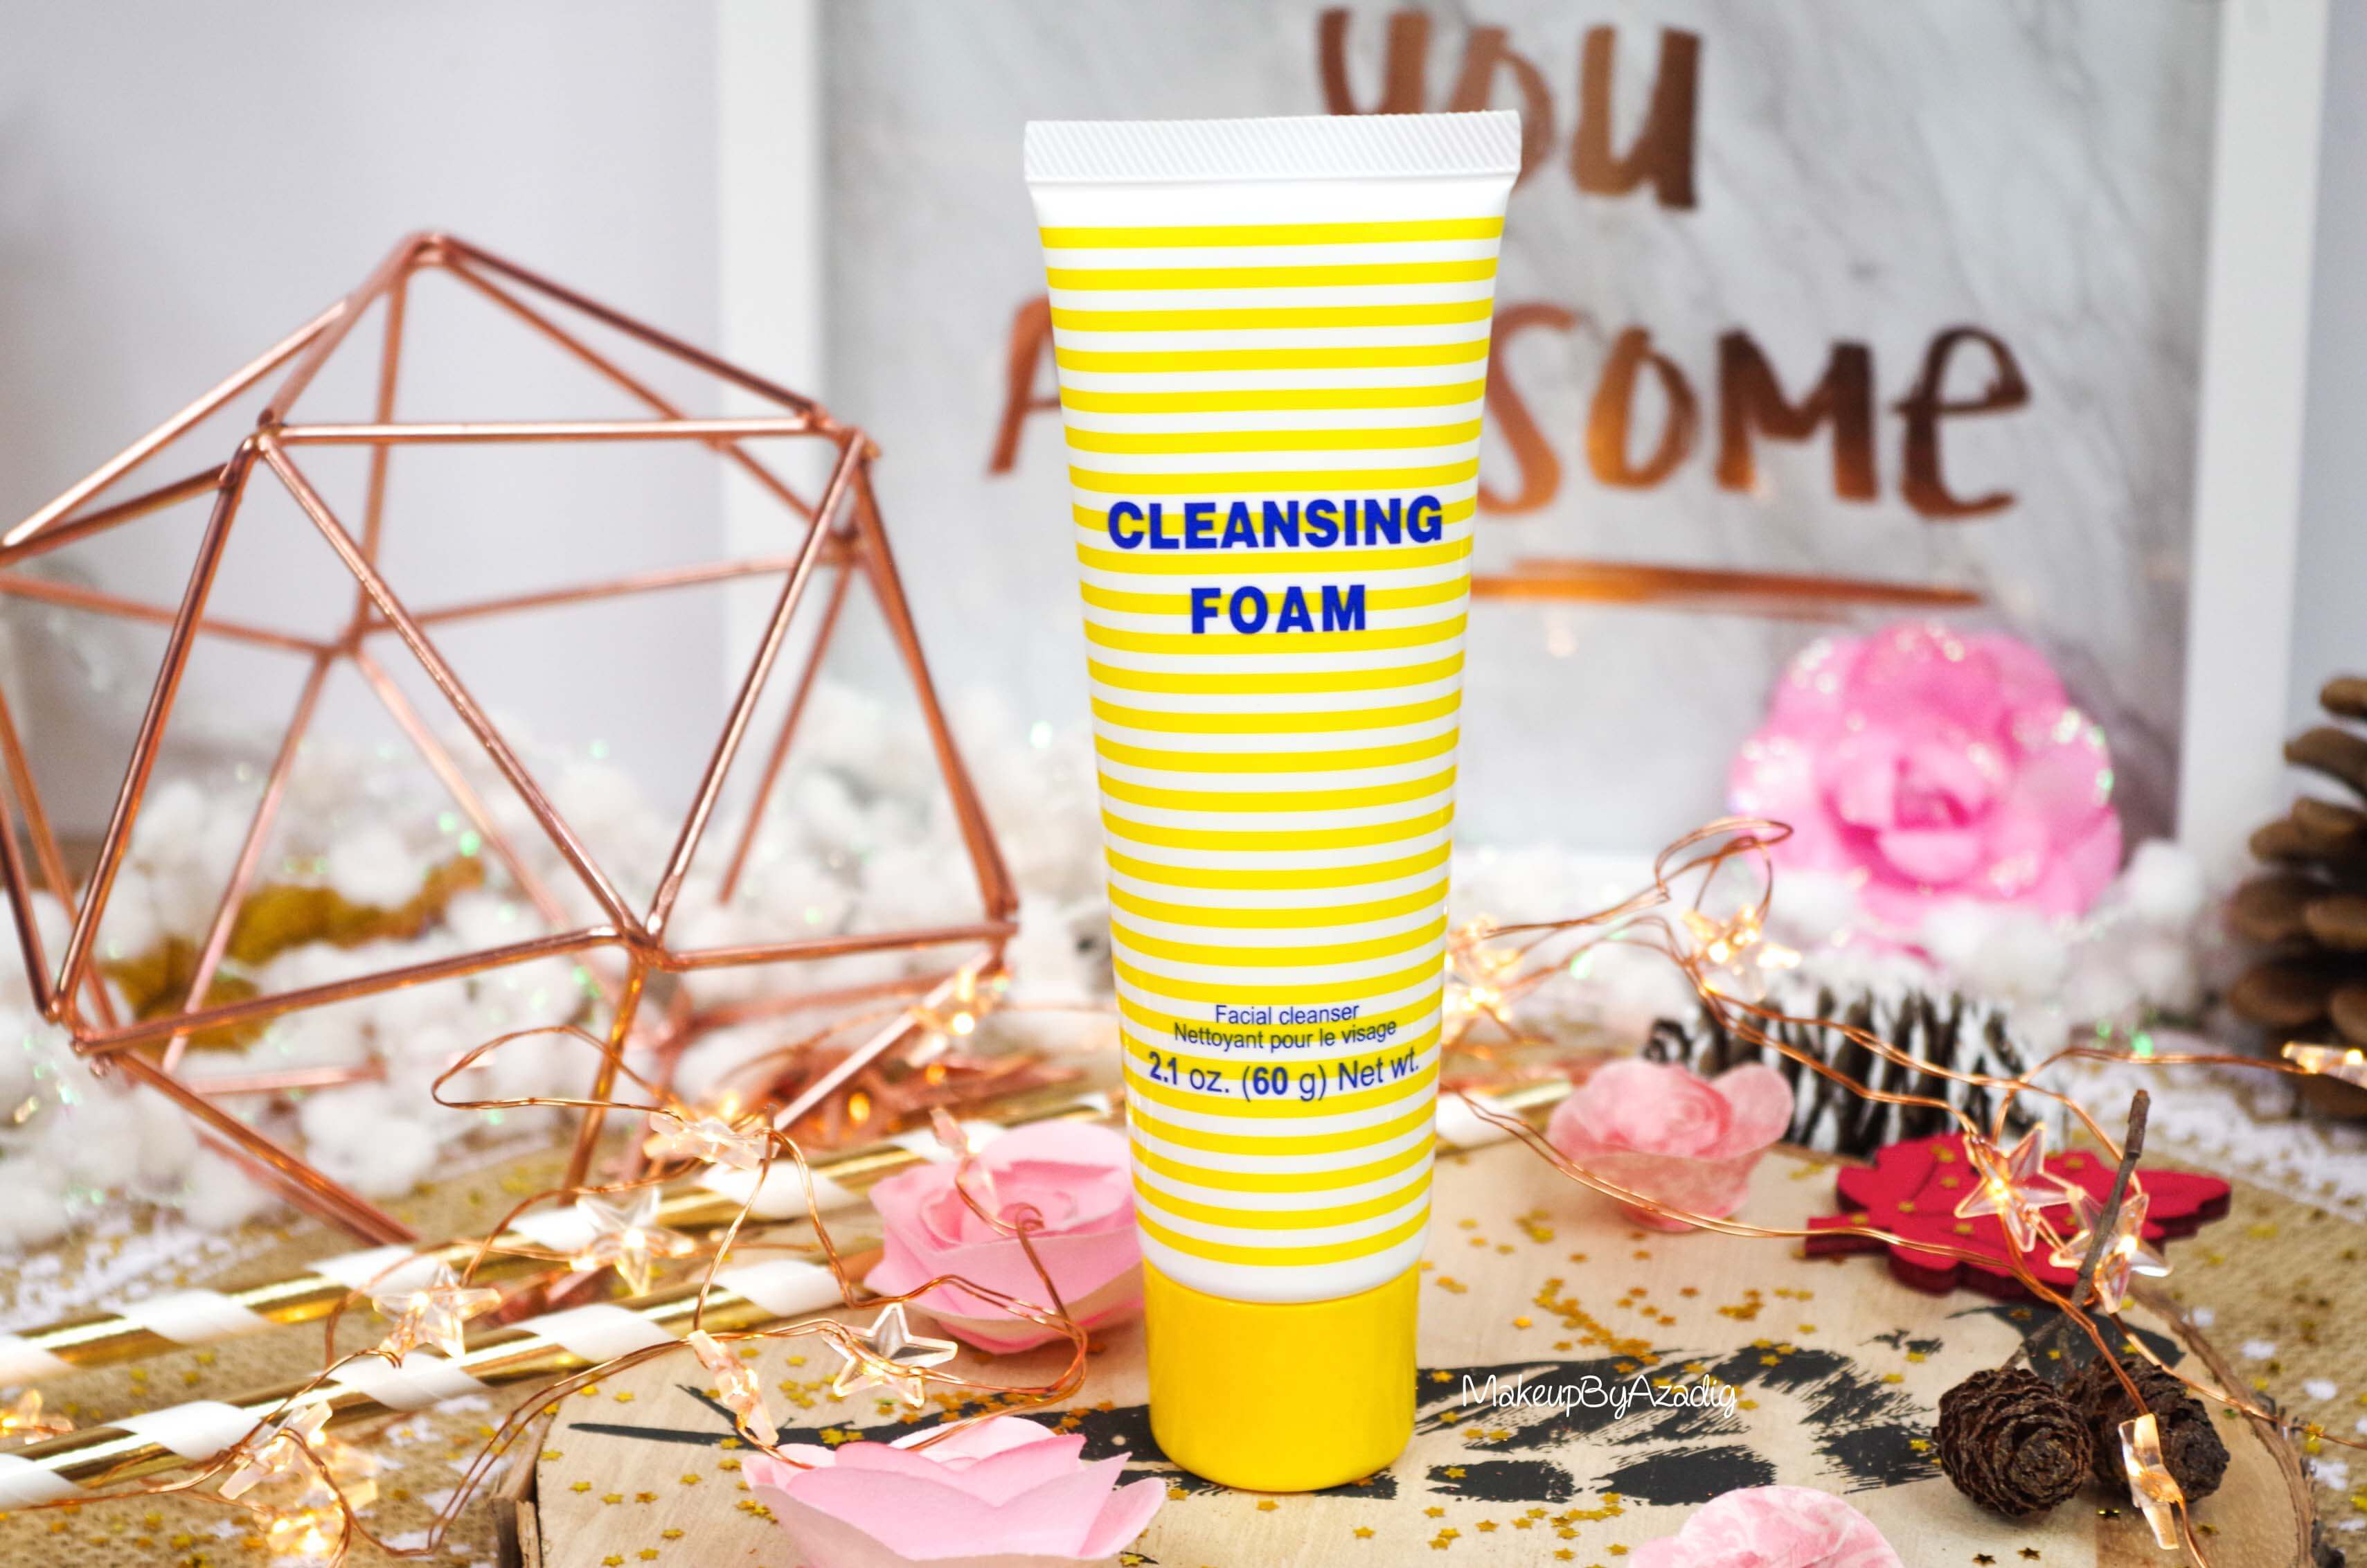 revue-review-cleansing-foam-creme-nettoyante-dhc-monoprix-parapharmacie-prix-avis-makeupbyazadig-tube